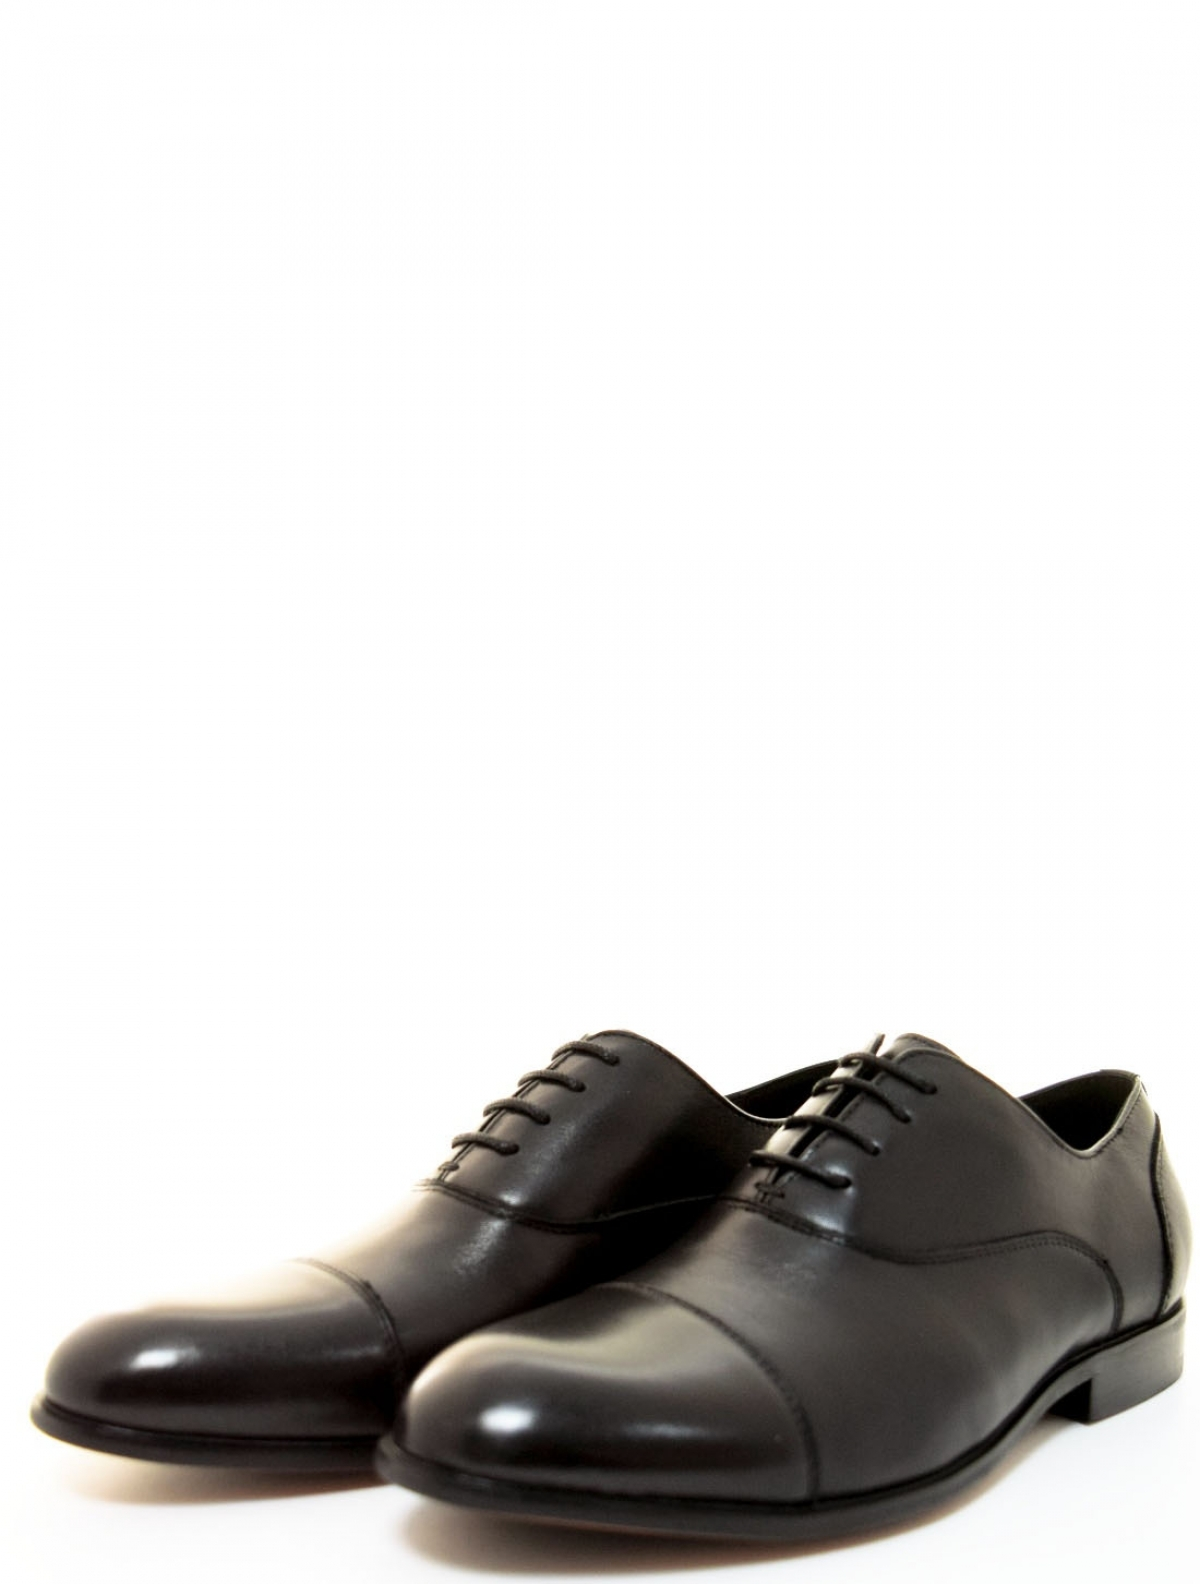 Roscote B159-D63-SW3-T2742 мужские туфли